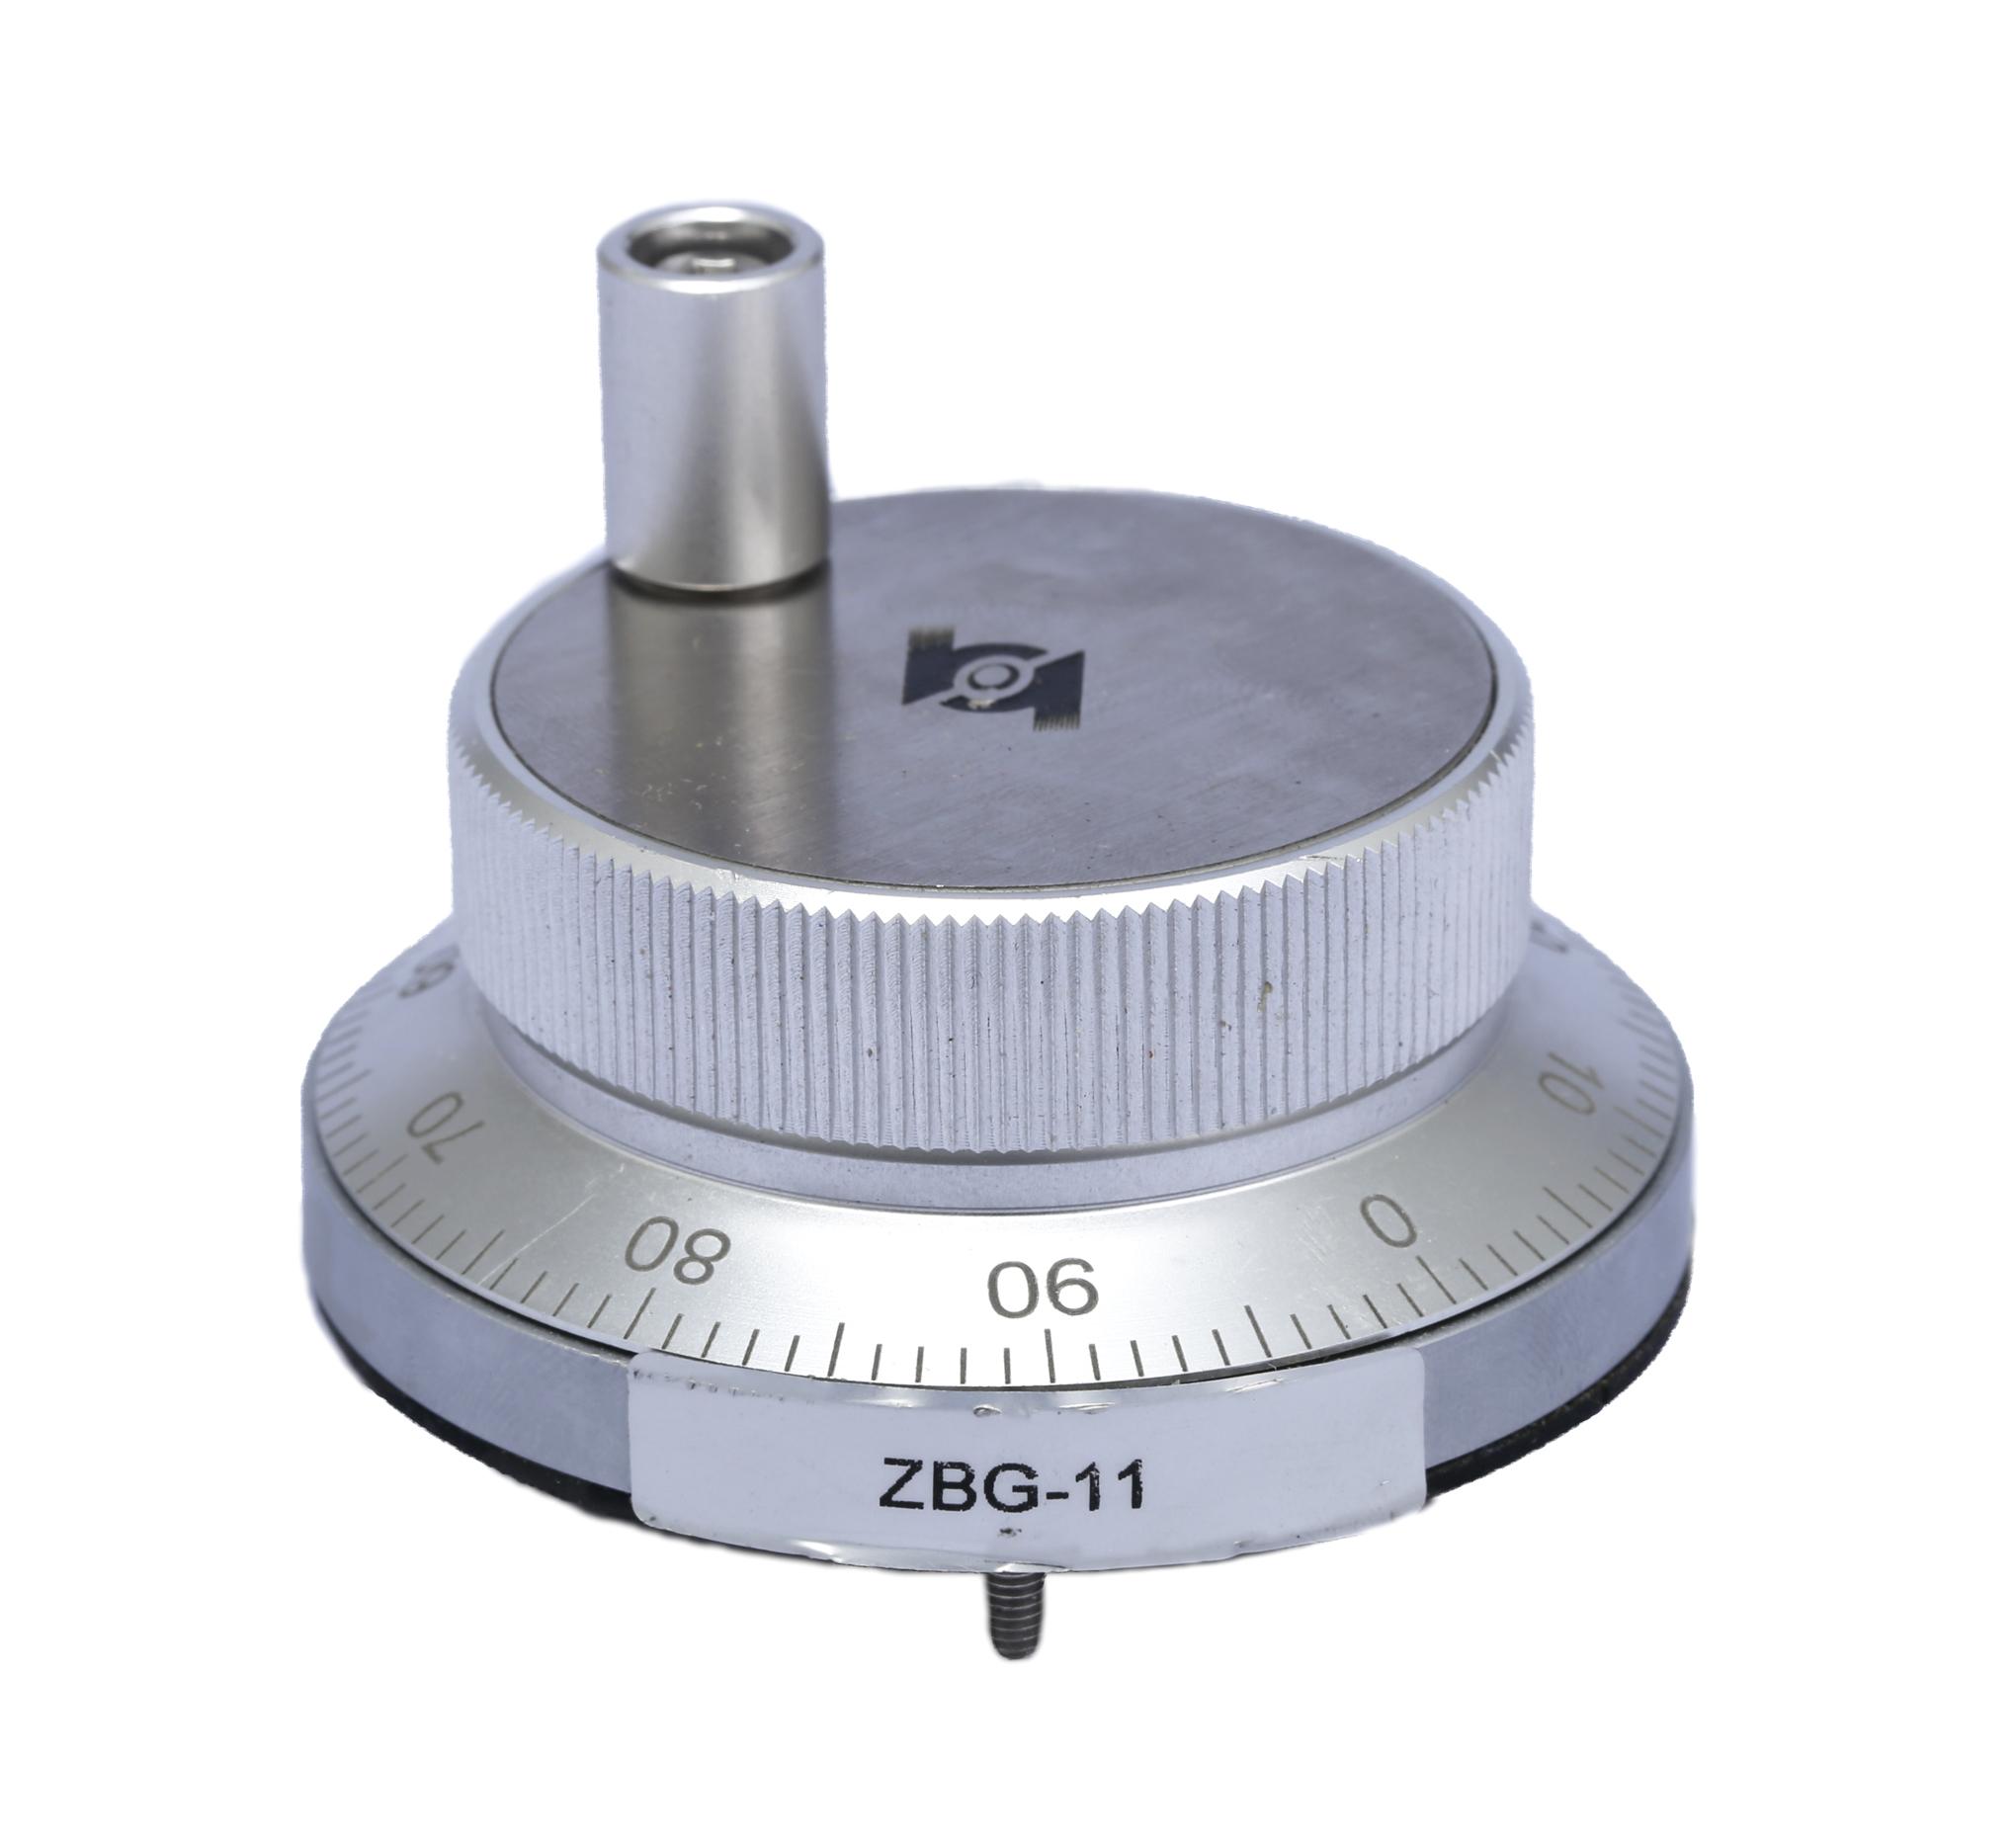 ZBG-11 增量式光栅旋转编码器 禹衡光学